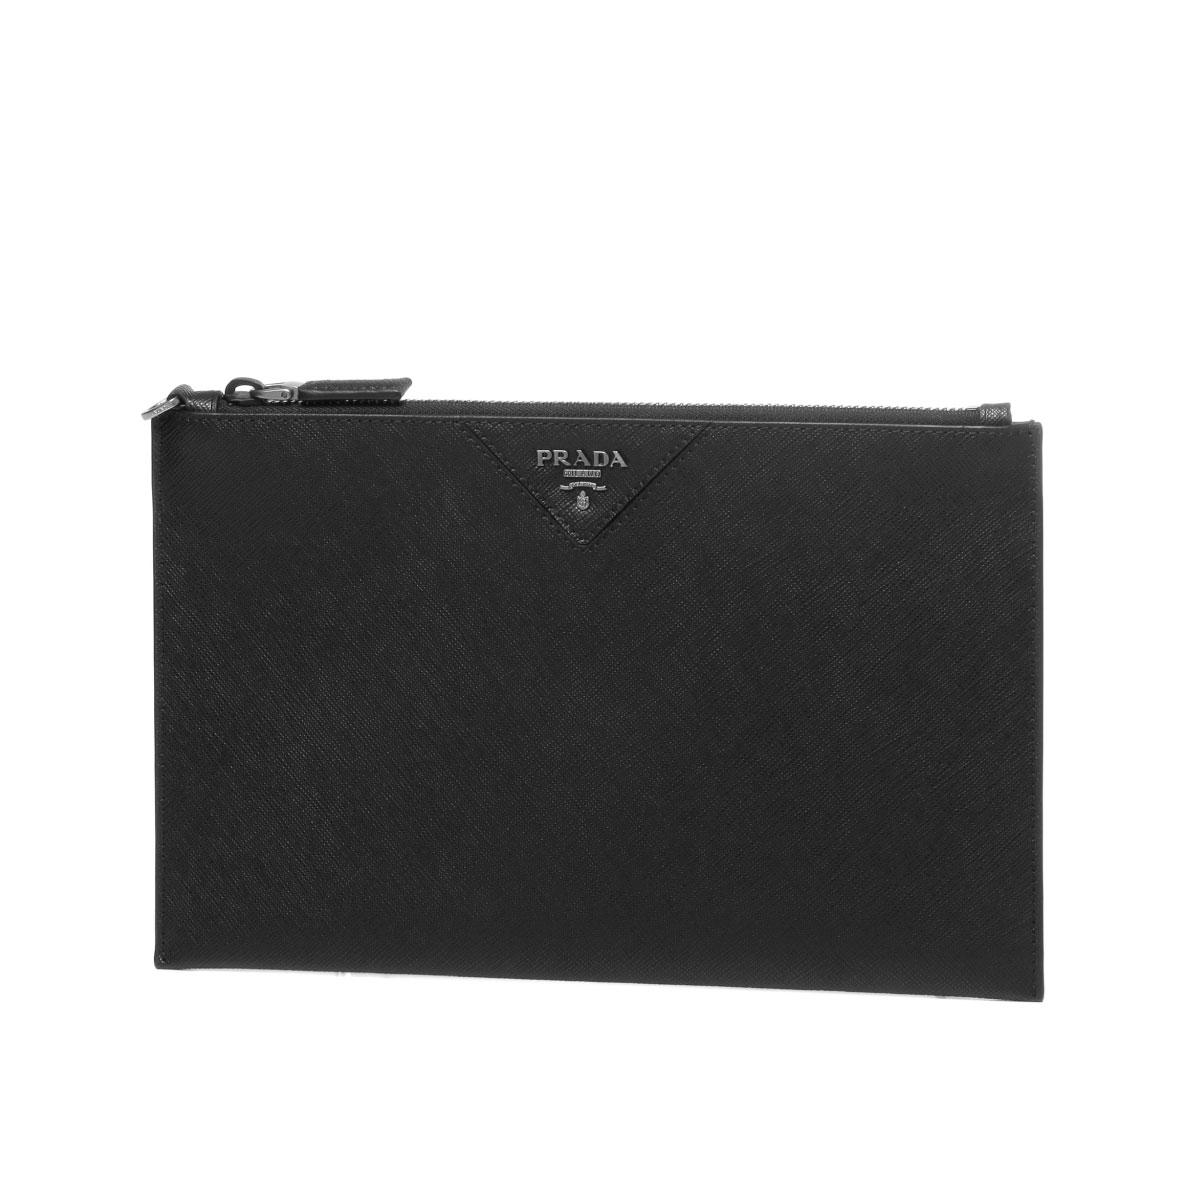 Prada Bag Men 2ng05v Qme F0002 Clutch Nero Black